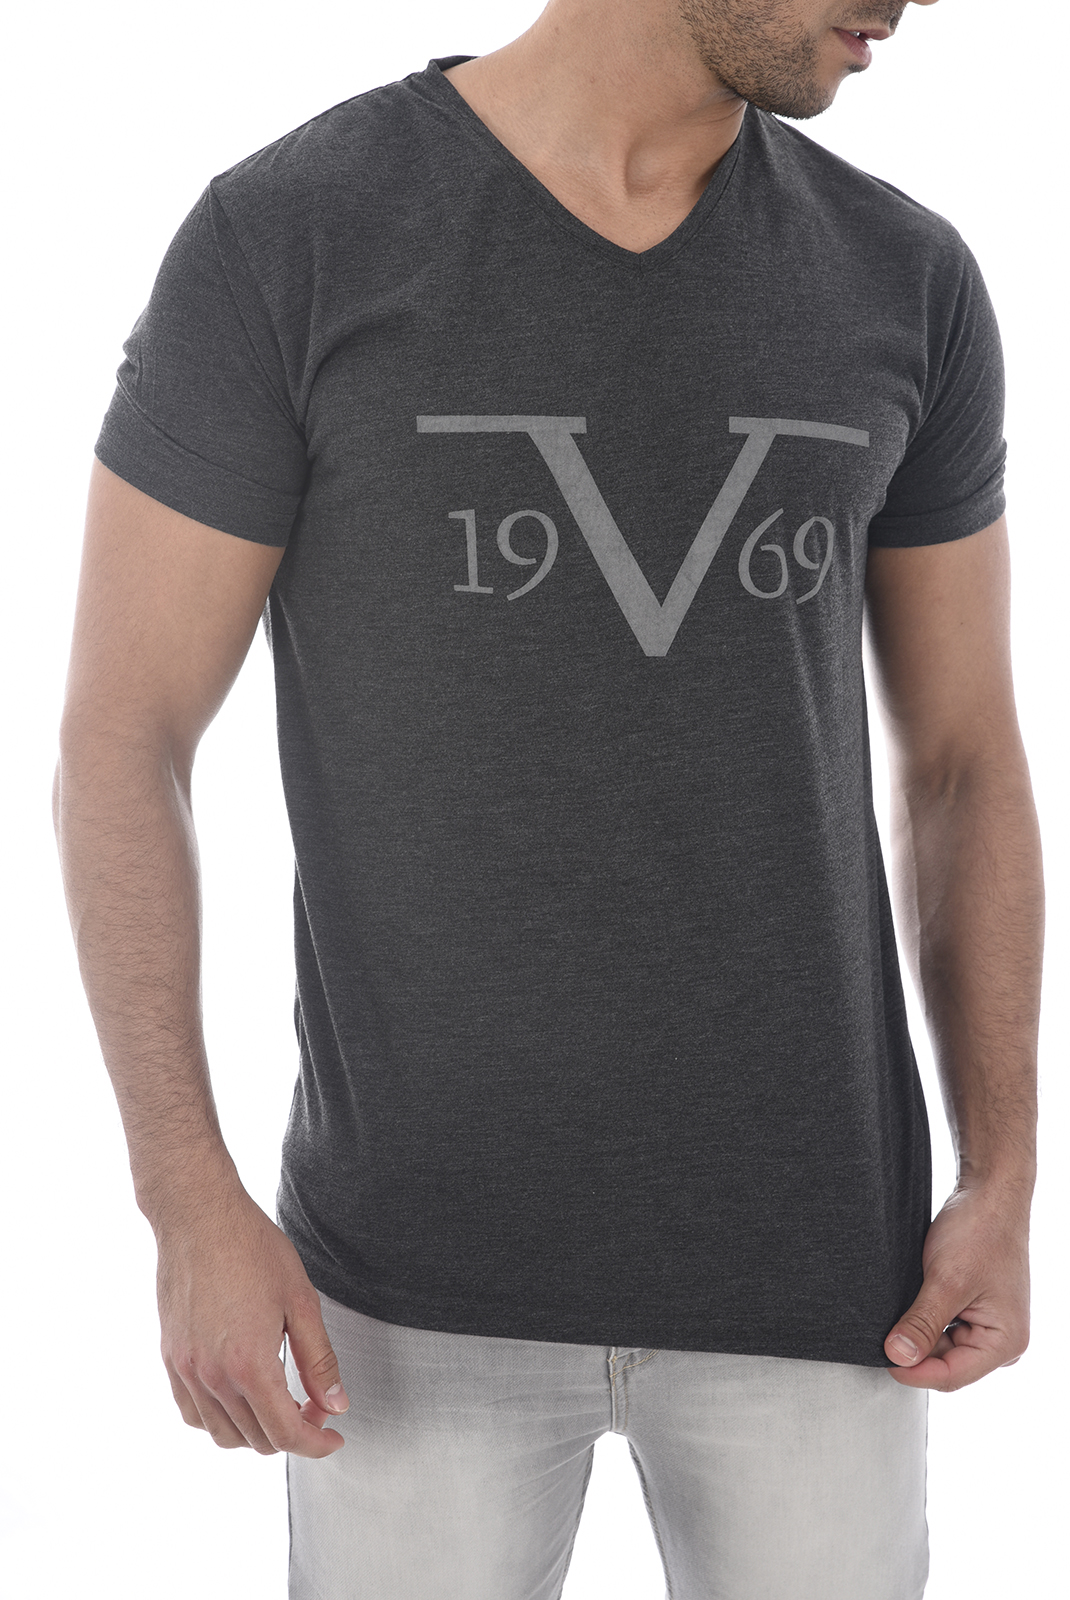 T-S manches courtes  19V69 by Versace 1969 SALERNE GRIS